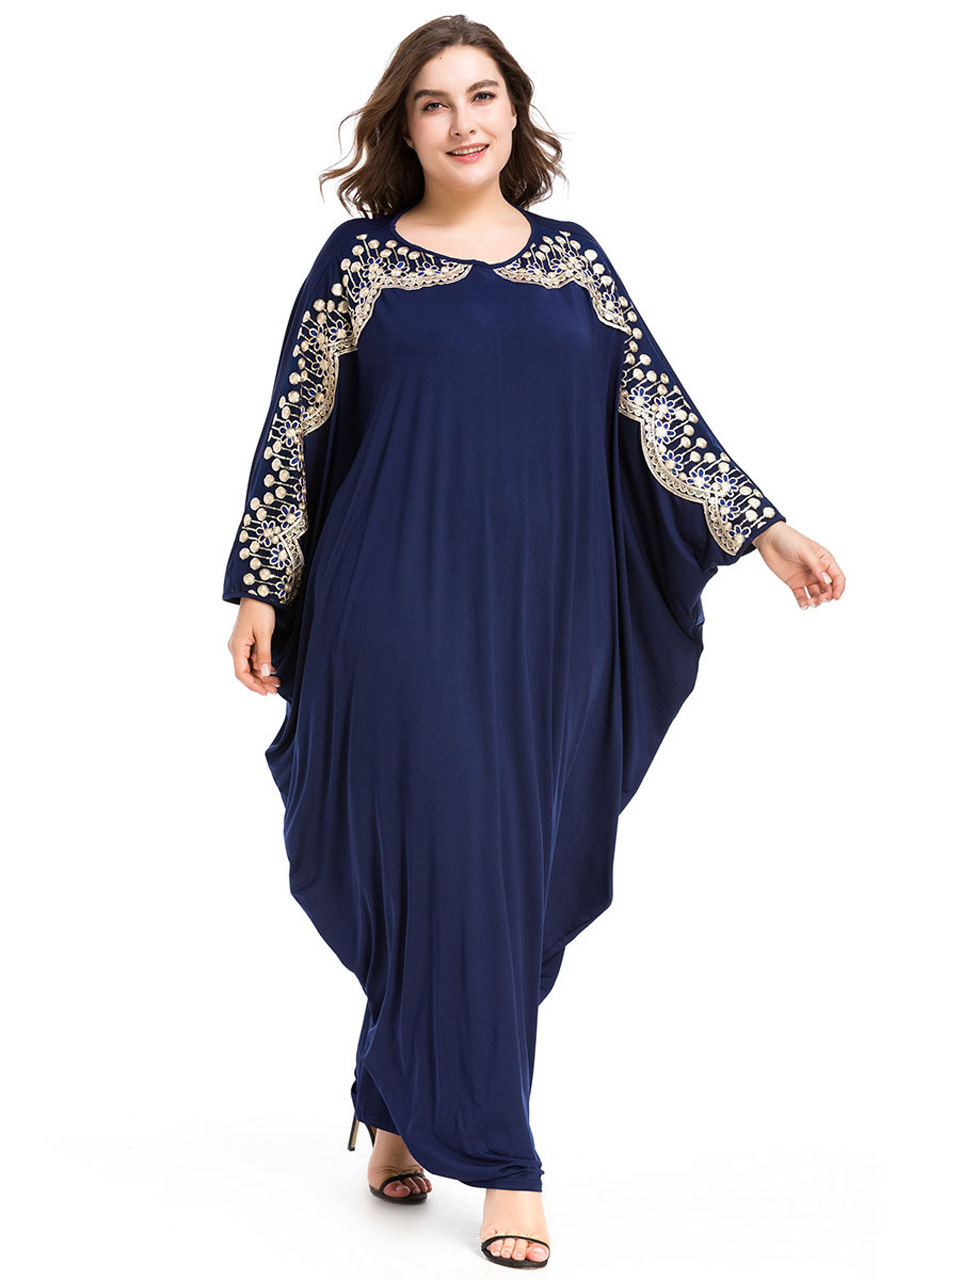 Loose large size women's dresses muslim abaya dress dubai bat sleeves islamic dress arabic kaftan plus size islamic clothing